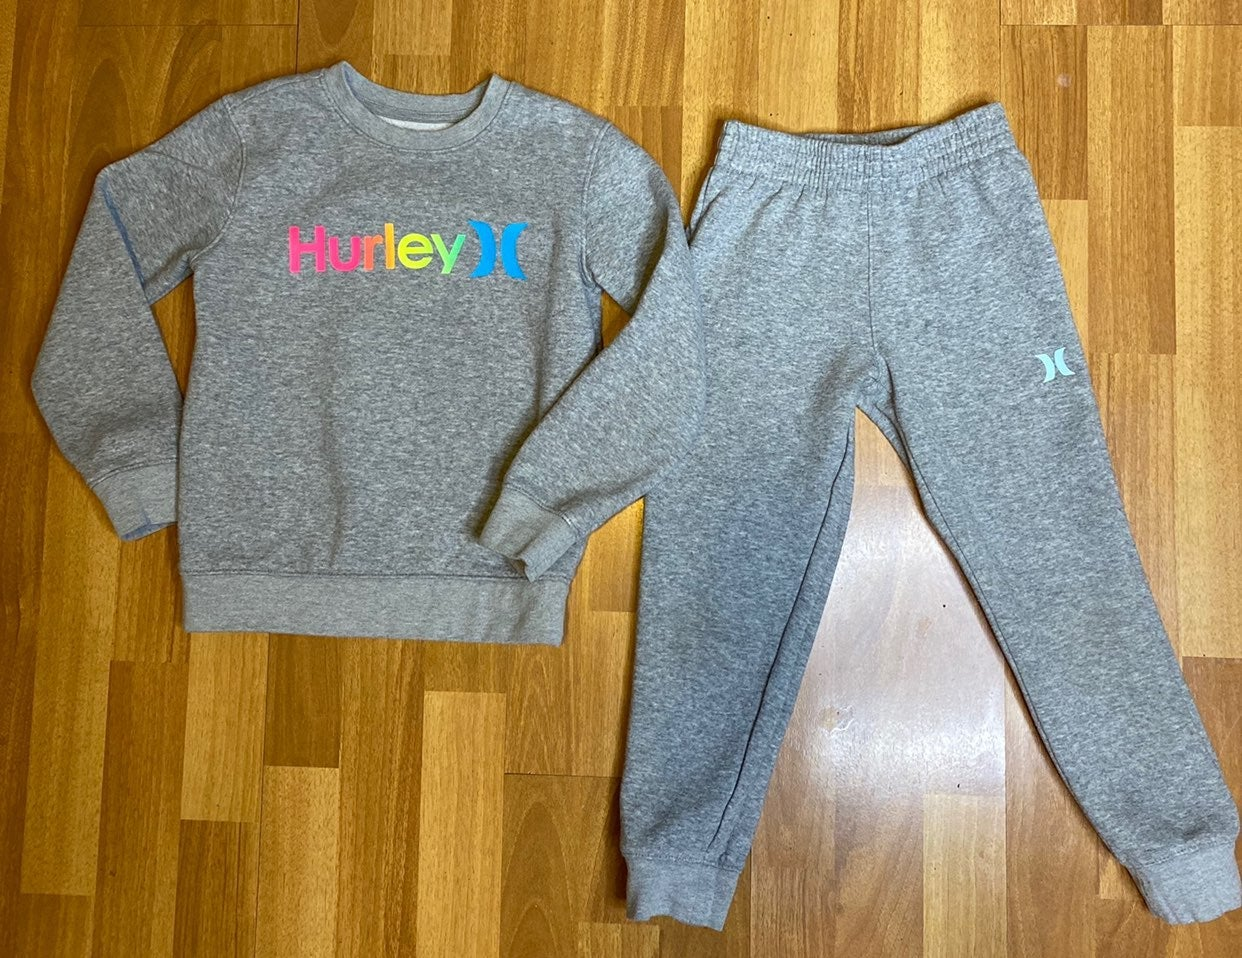 Hurley Sweatsuit Size 6T